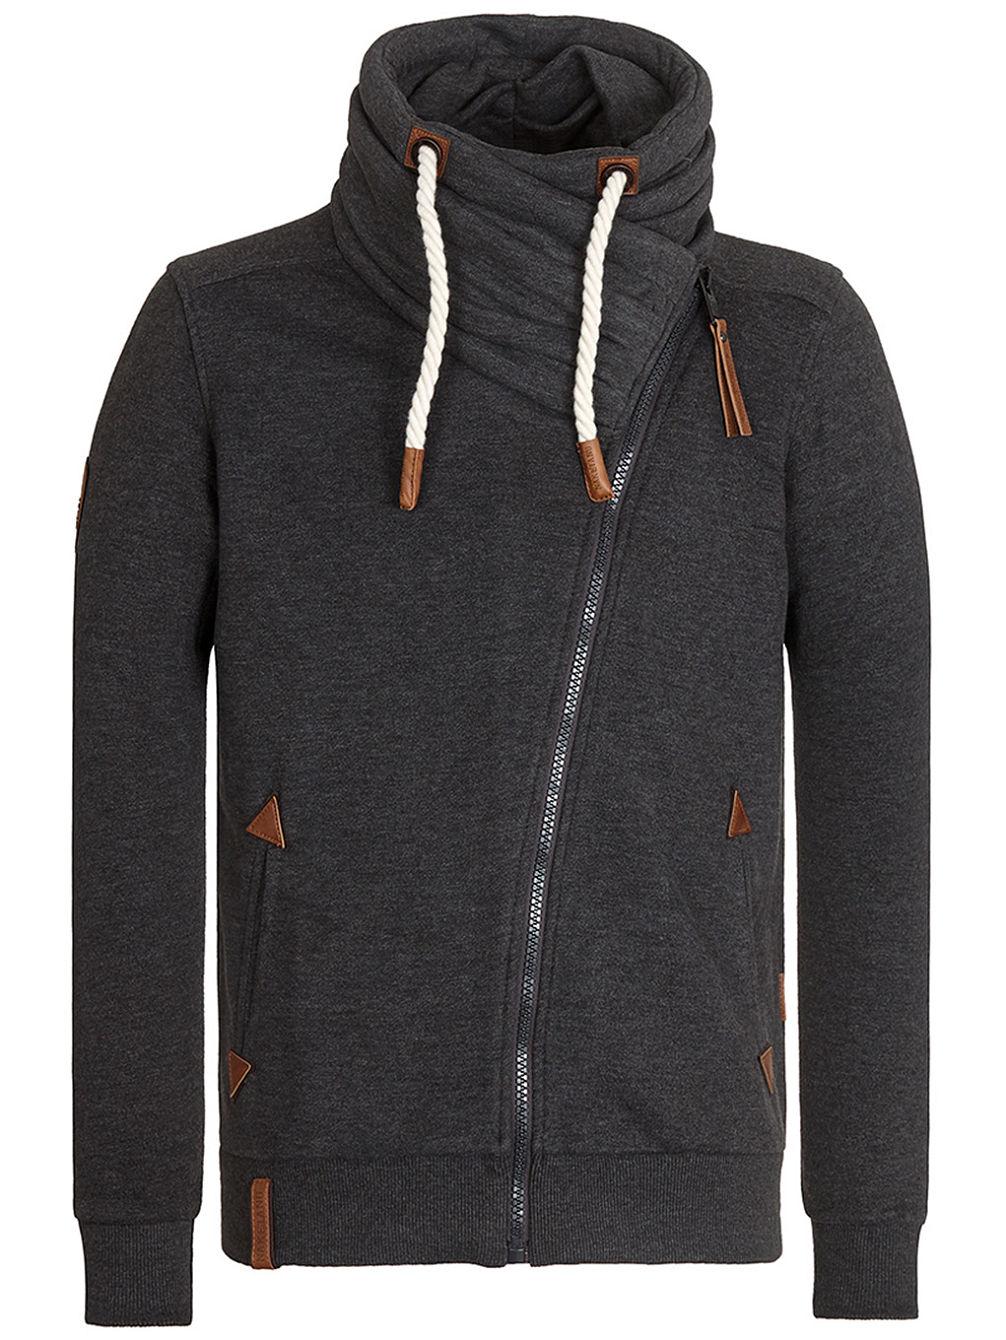 buy naketano jan mopila zip hoodie online at blue. Black Bedroom Furniture Sets. Home Design Ideas